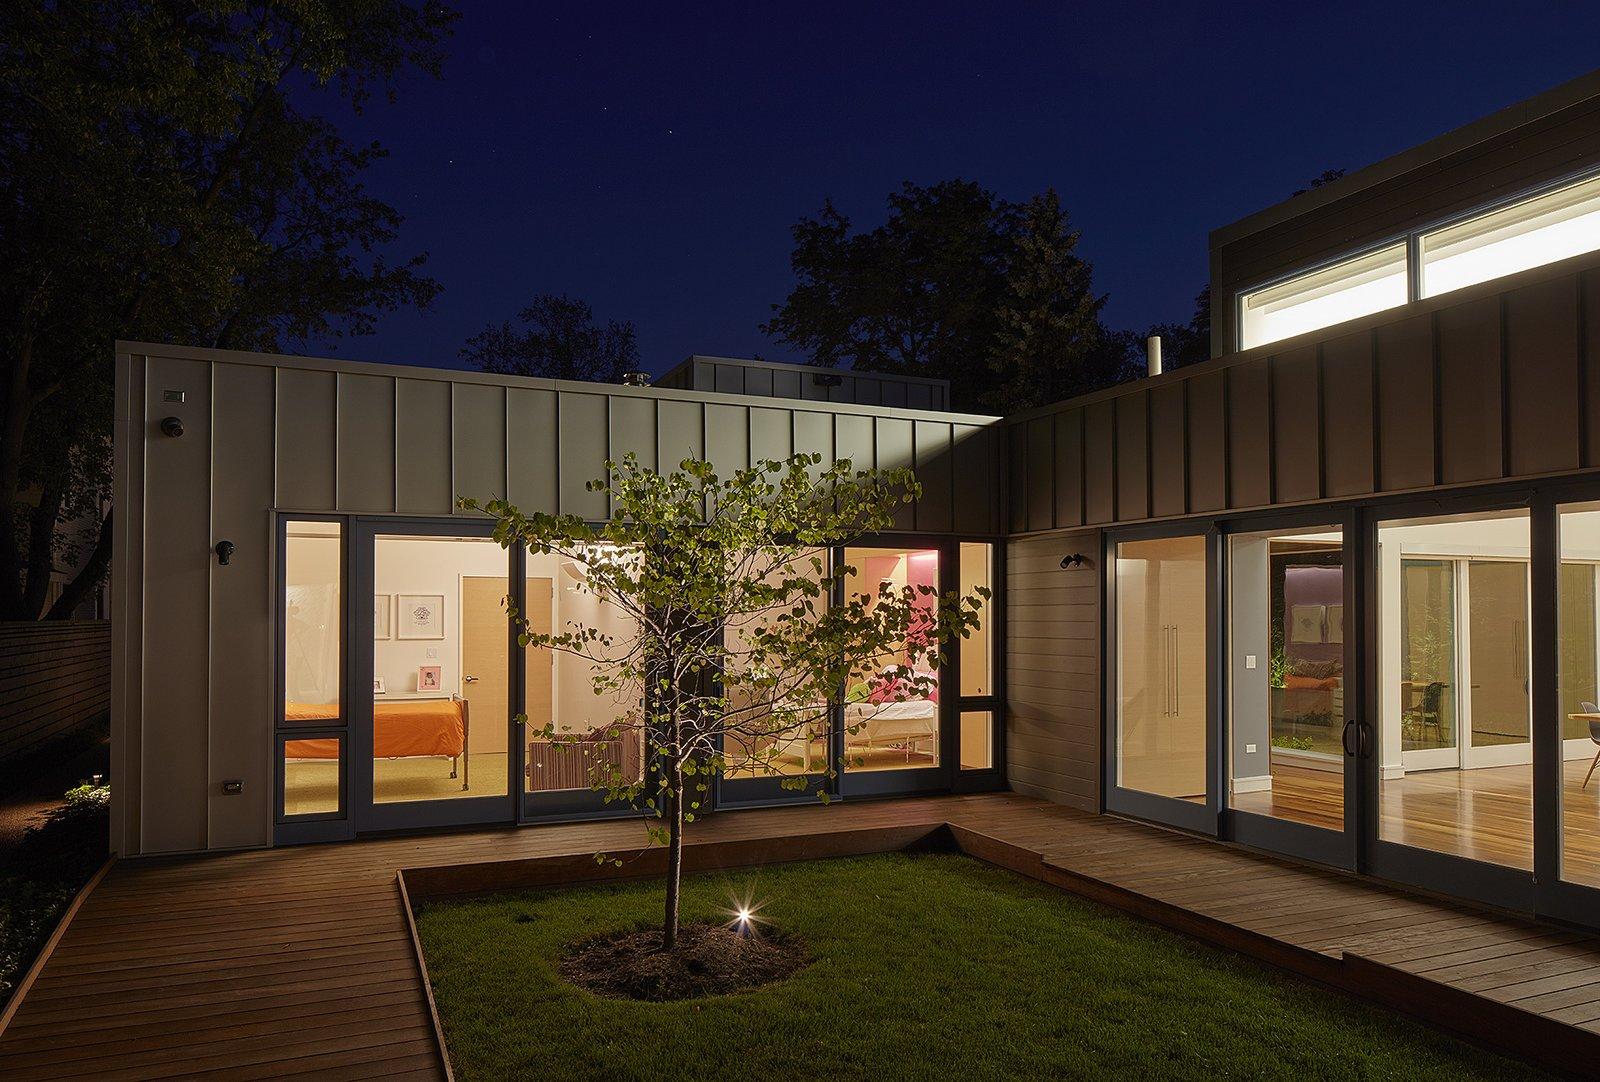 courtyard  Courtyard Residence by Kuklinski + Rappe Architects